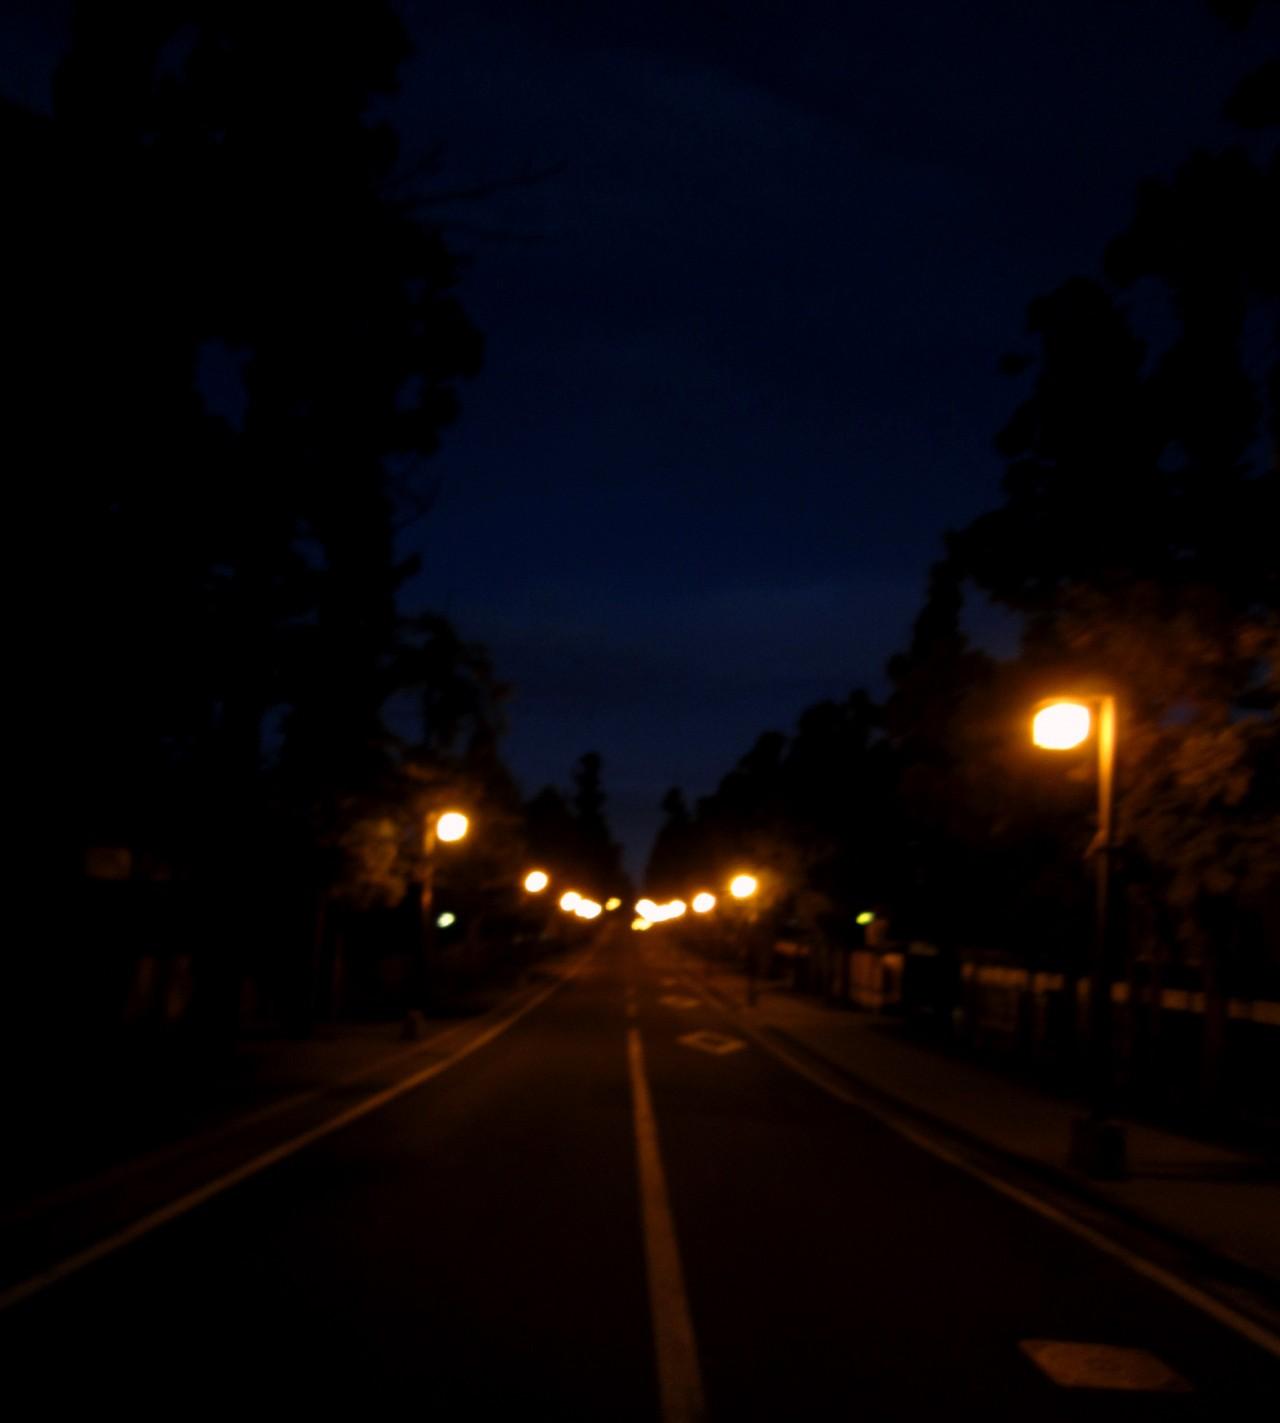 青森 弘前市 津軽 街並み 夜